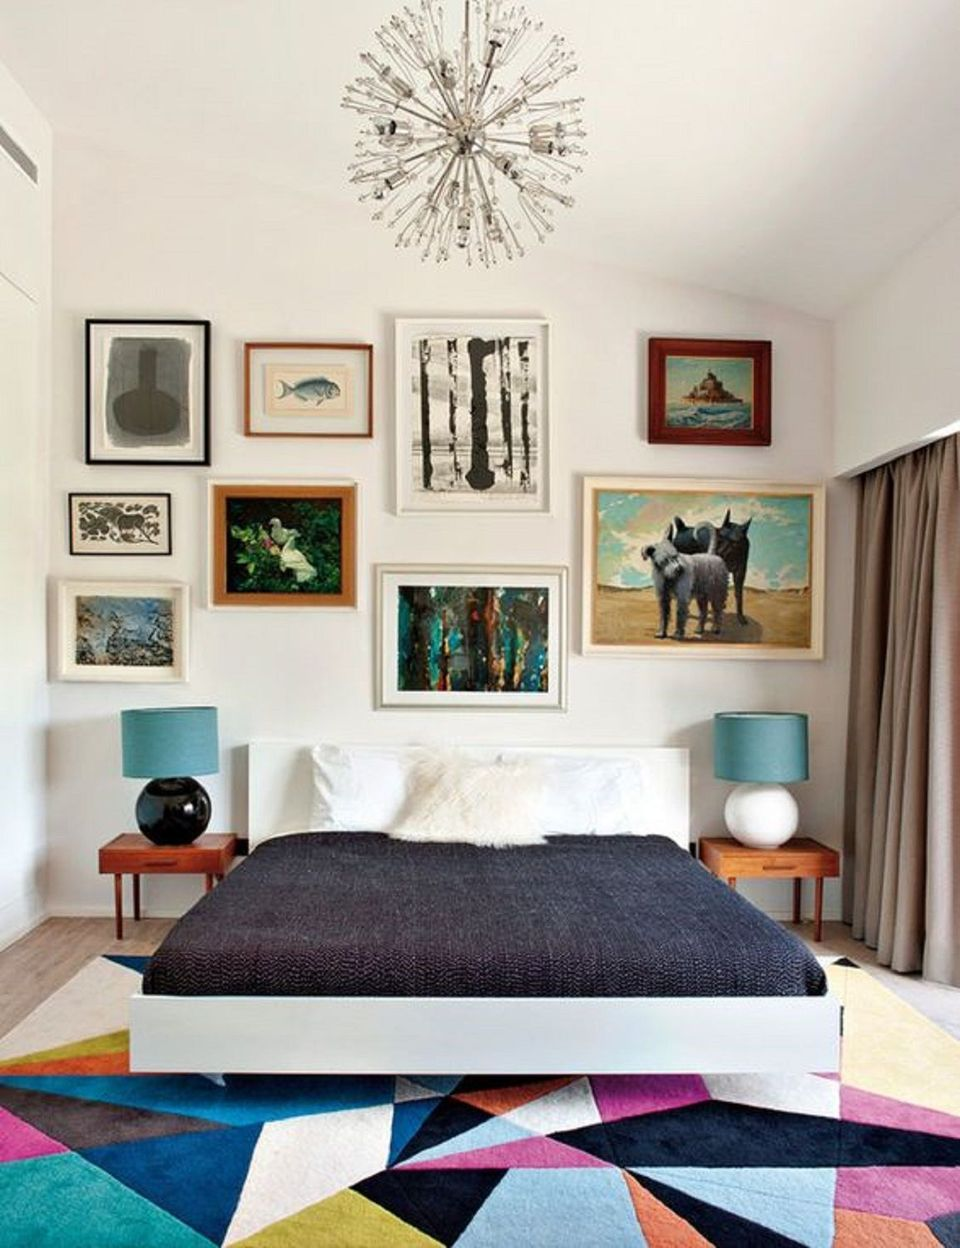 25 Gorgeous Midcentury Modern Bedrooms 25 Gorgeous